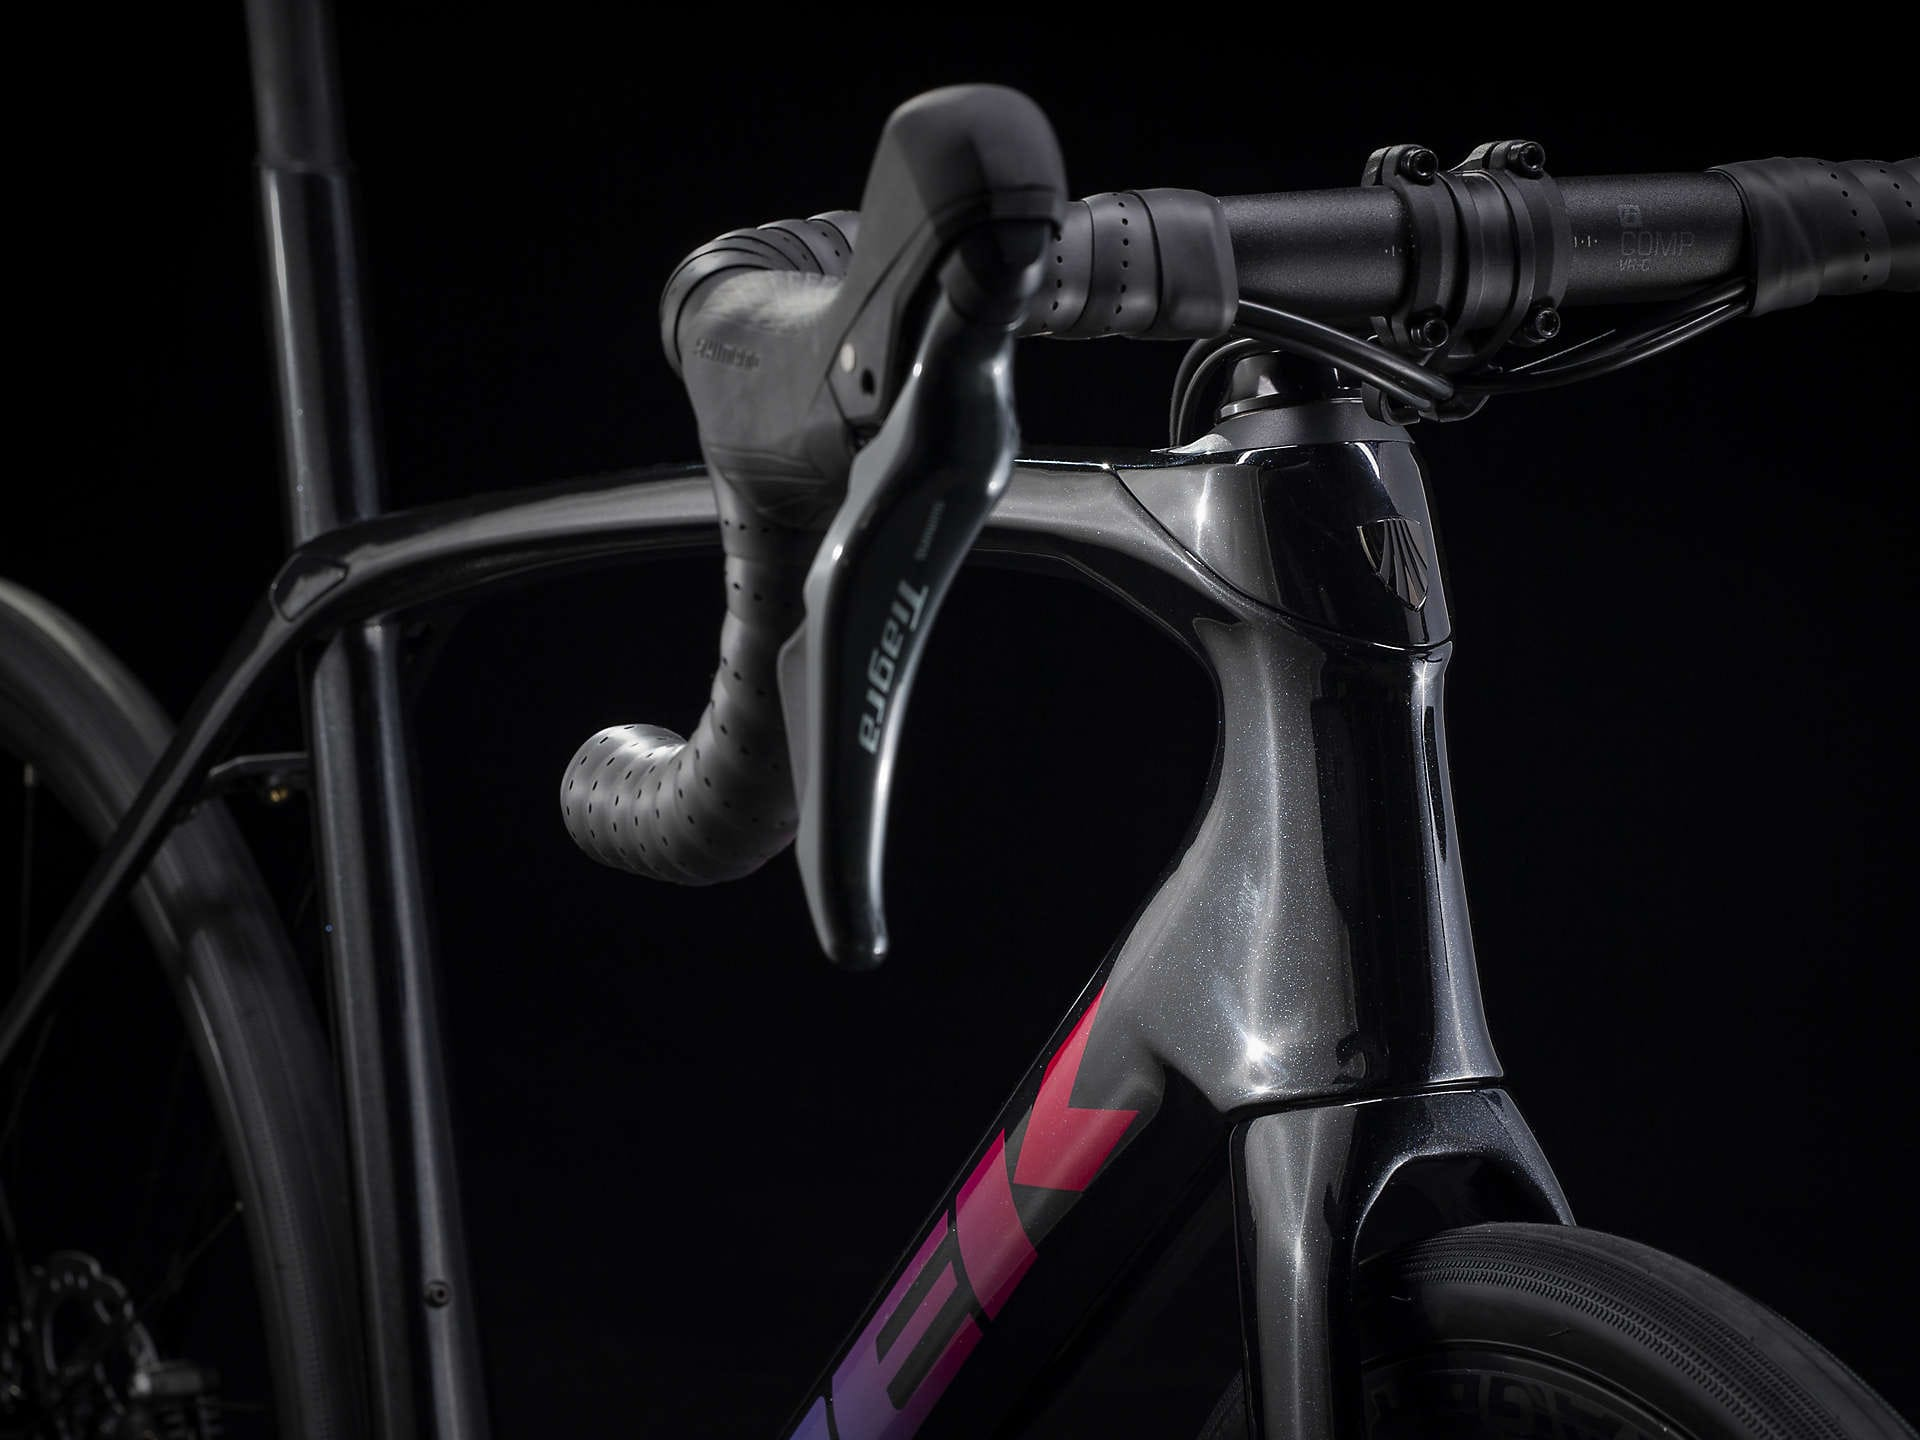 TREK DOMANE SL 4 ROAD BIKE 2020 | All Terrain Cycles